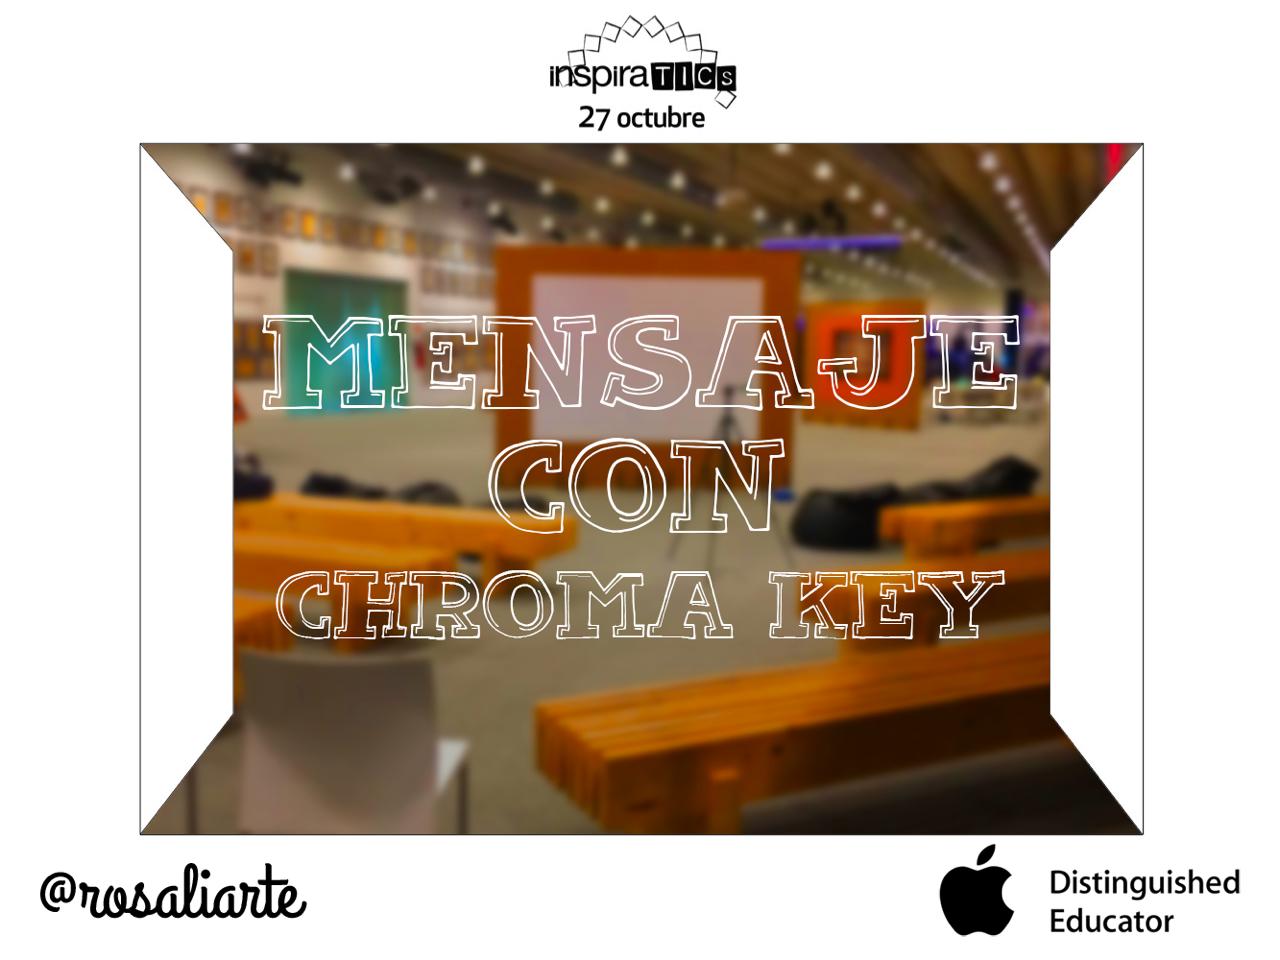 InspiraTICs 2016 – Un mensaje con Chroma Key